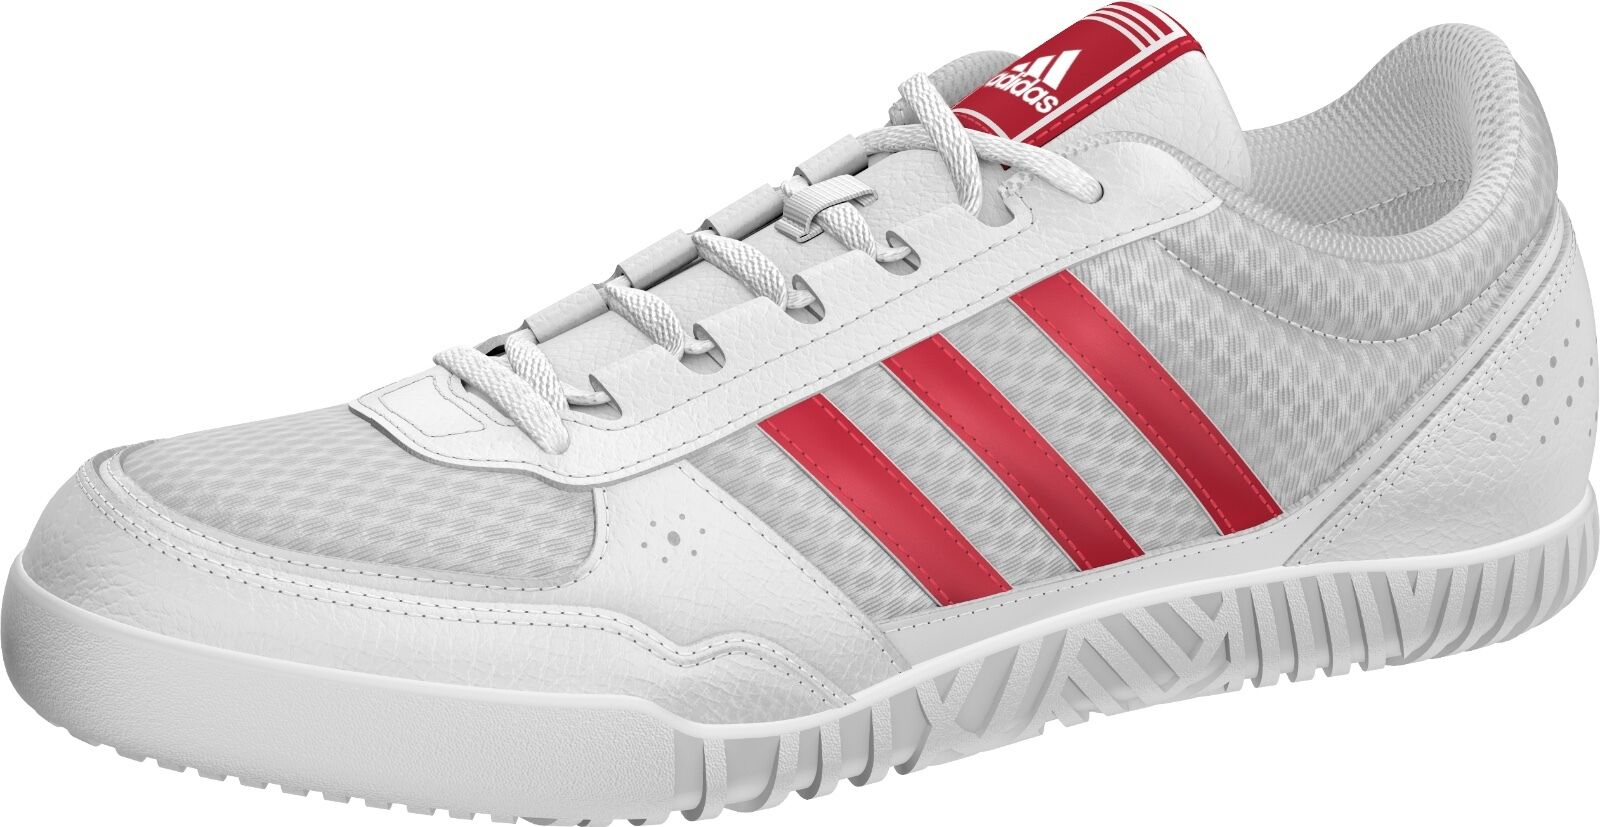 Adidas Sneaker weiß 24/7 Neues Modell 2016 NEU+OVP